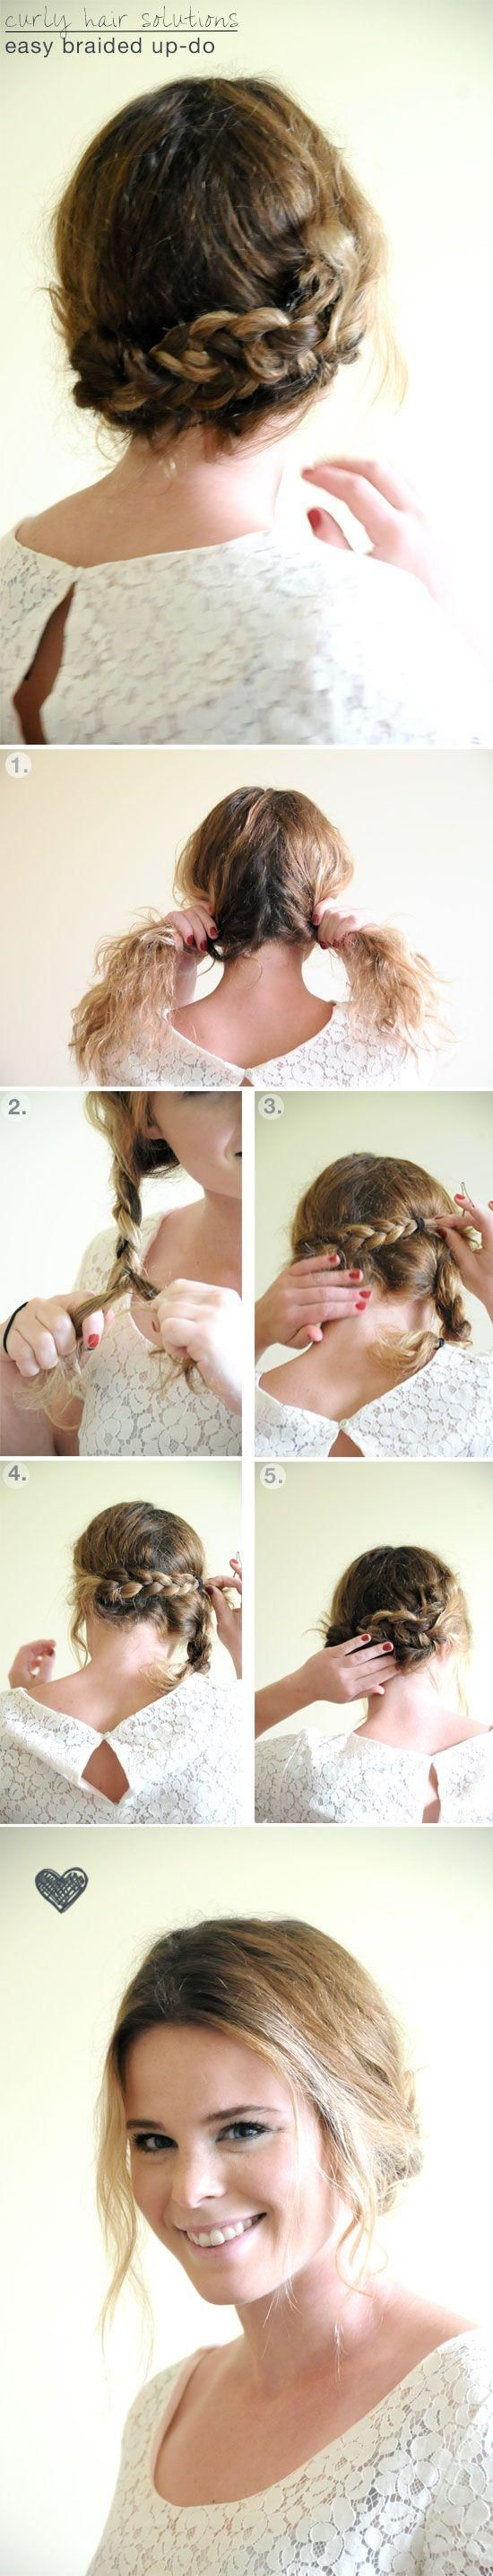 cute & easy braided updo